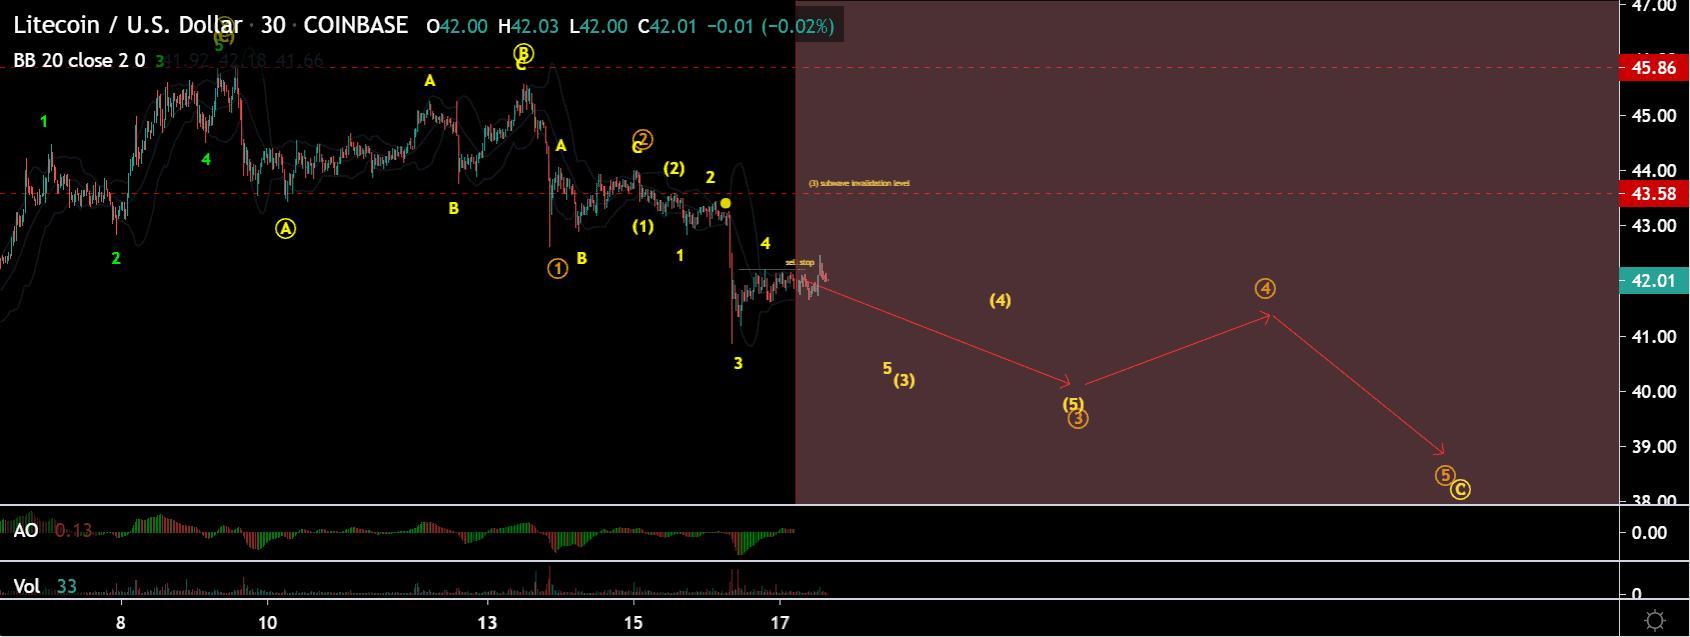 Litecoin price chart 3 - 17 July